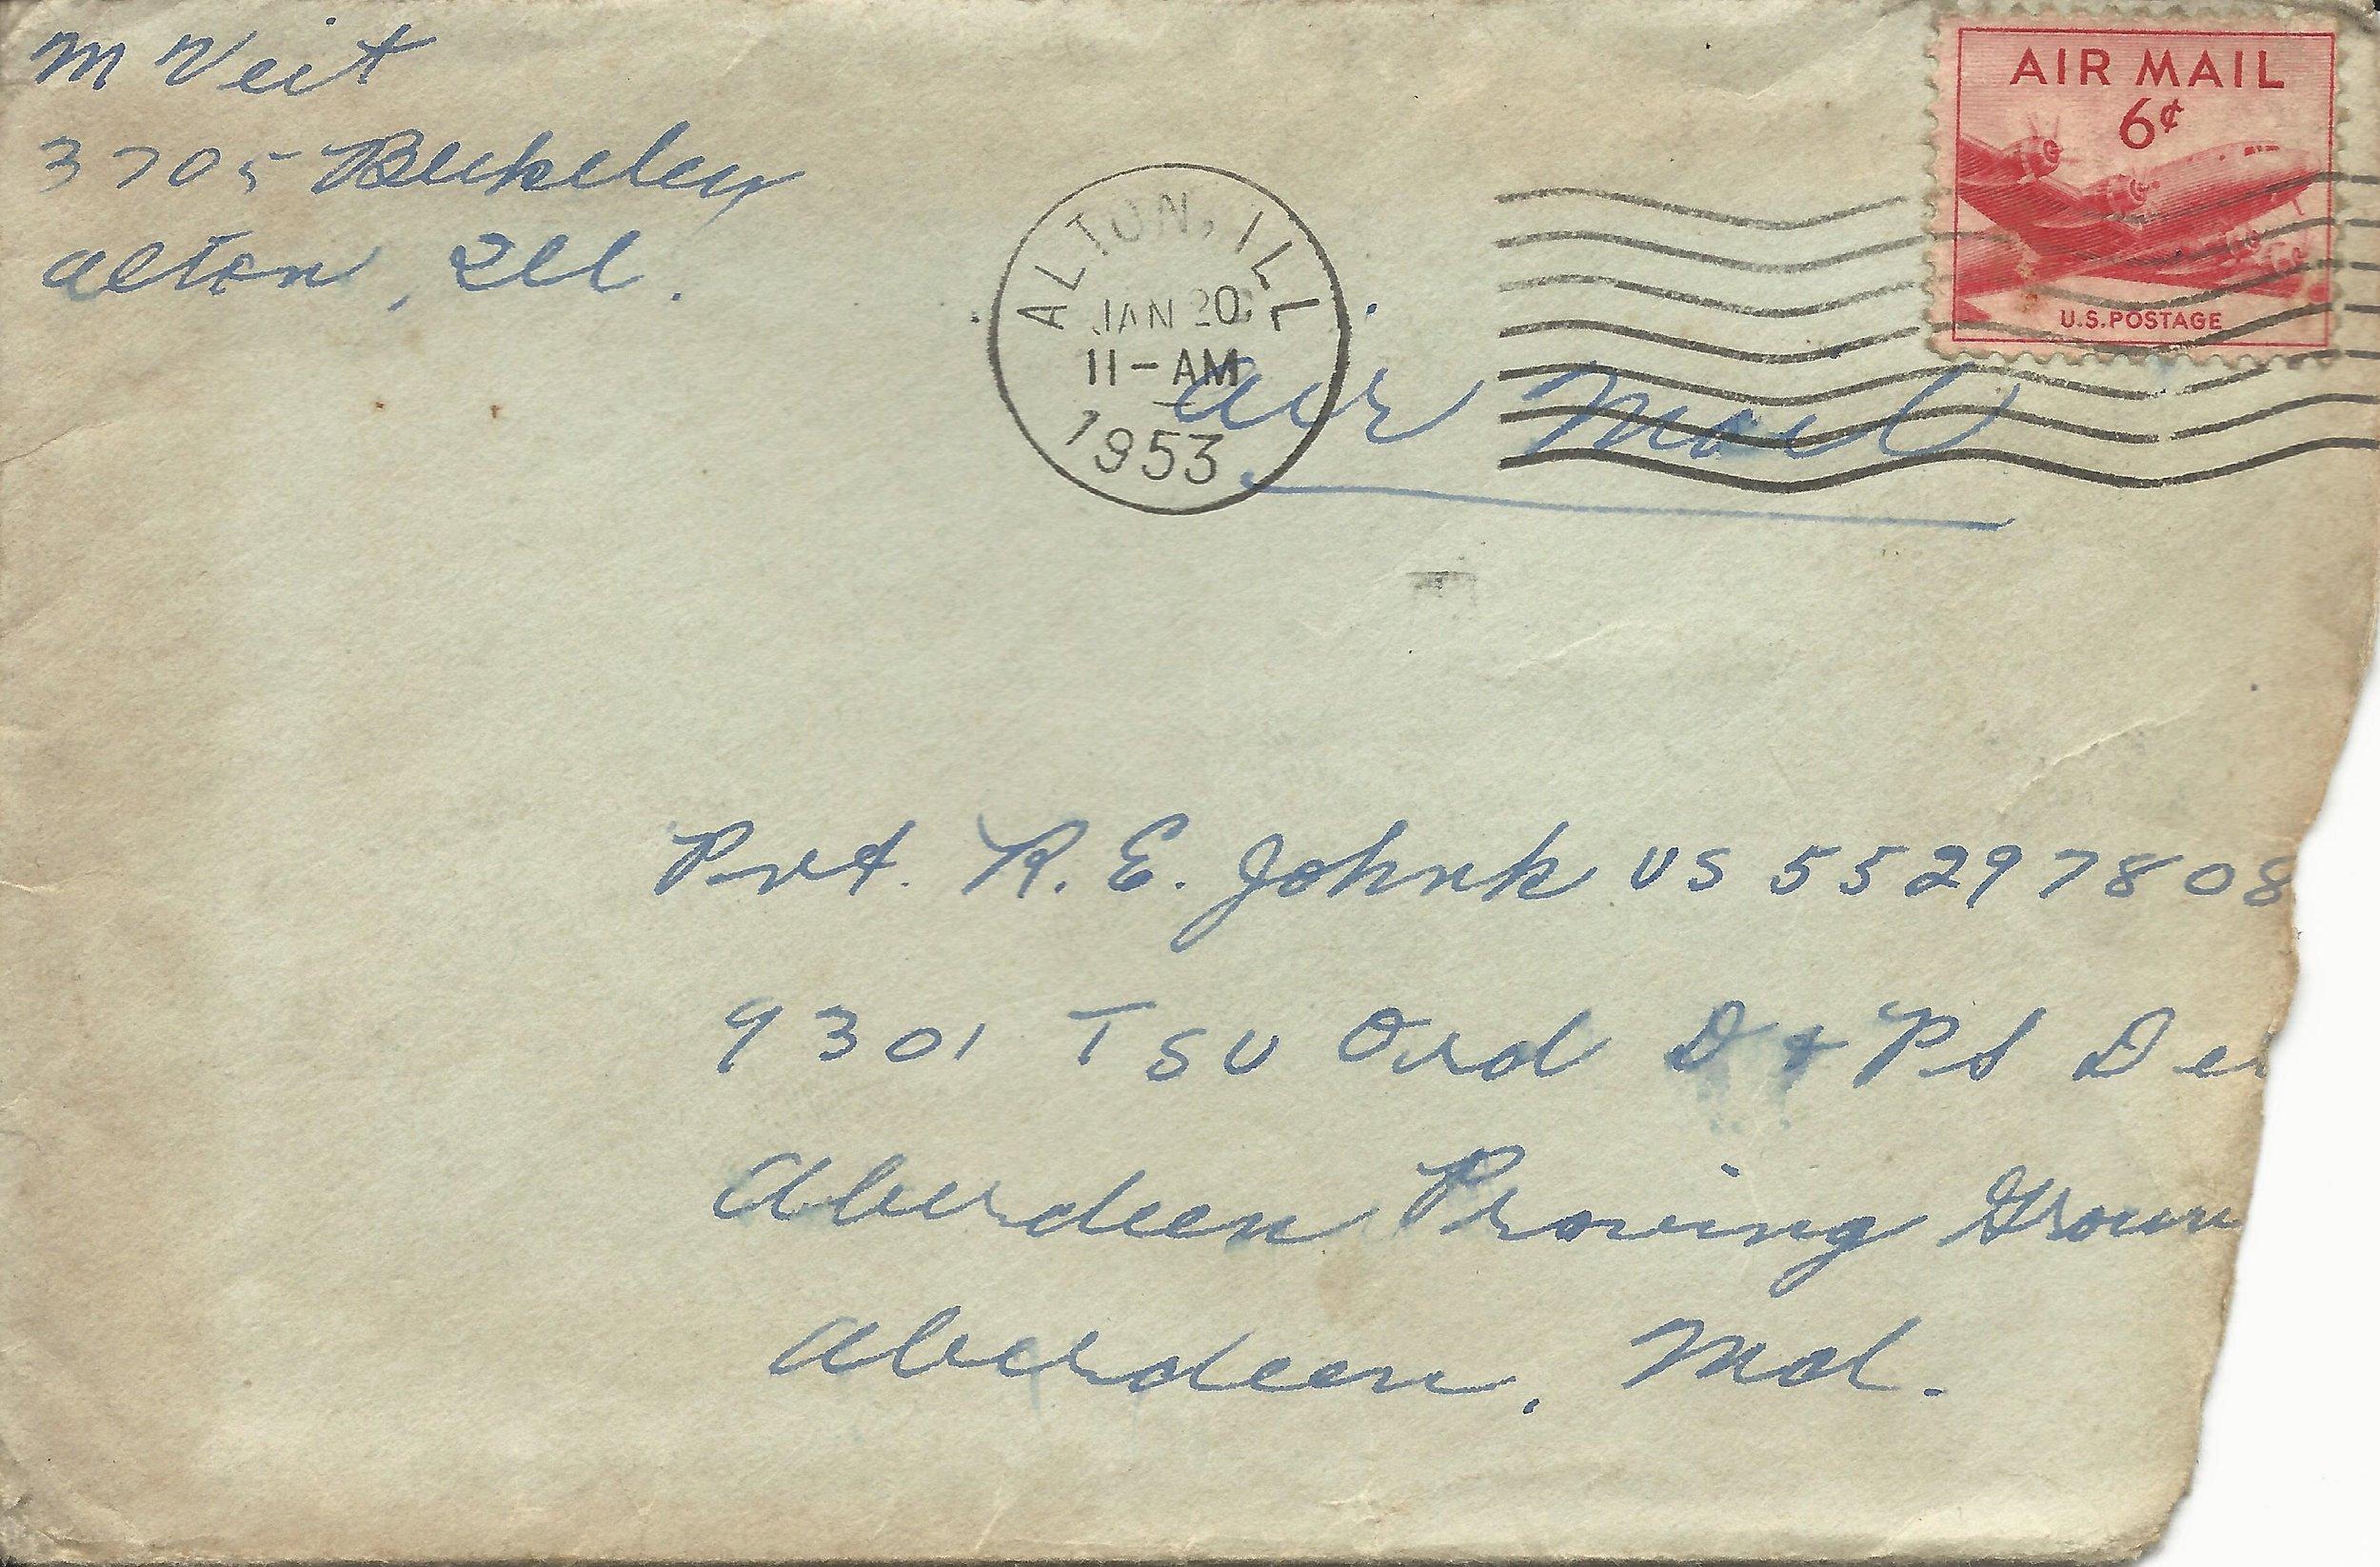 10. Jan. 18, 1953 (Oma)_Page_1.jpg